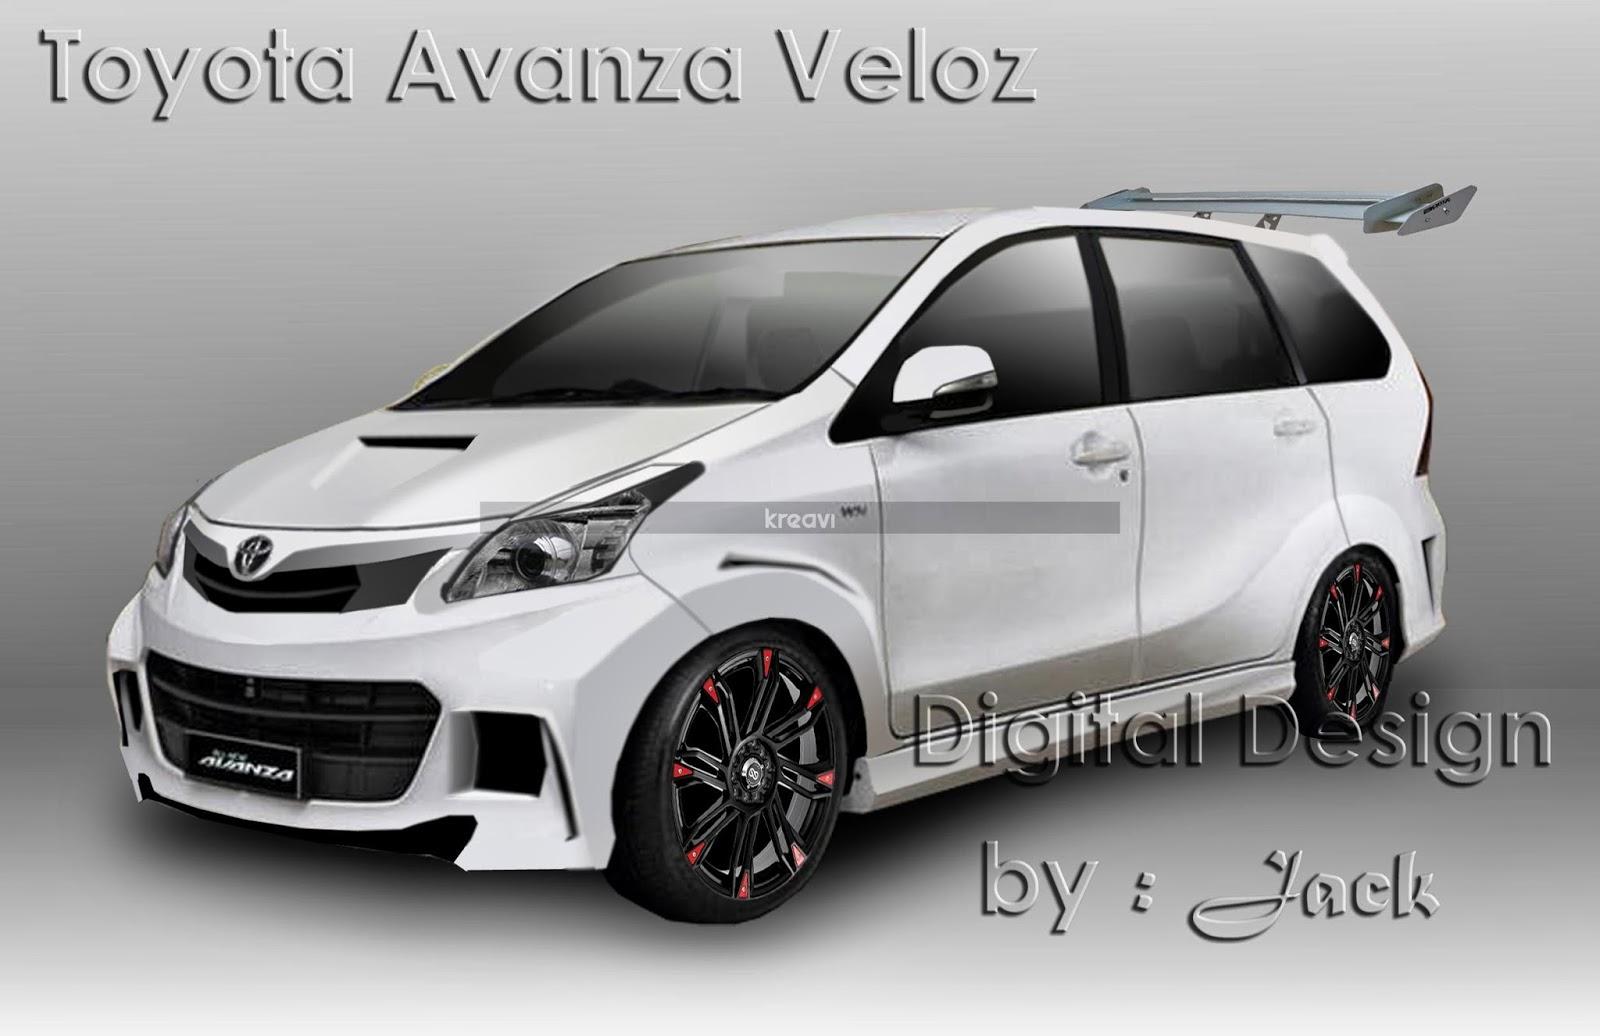 Pasar Harga Mobil: Harga Toyota Avanza Veloz Baru